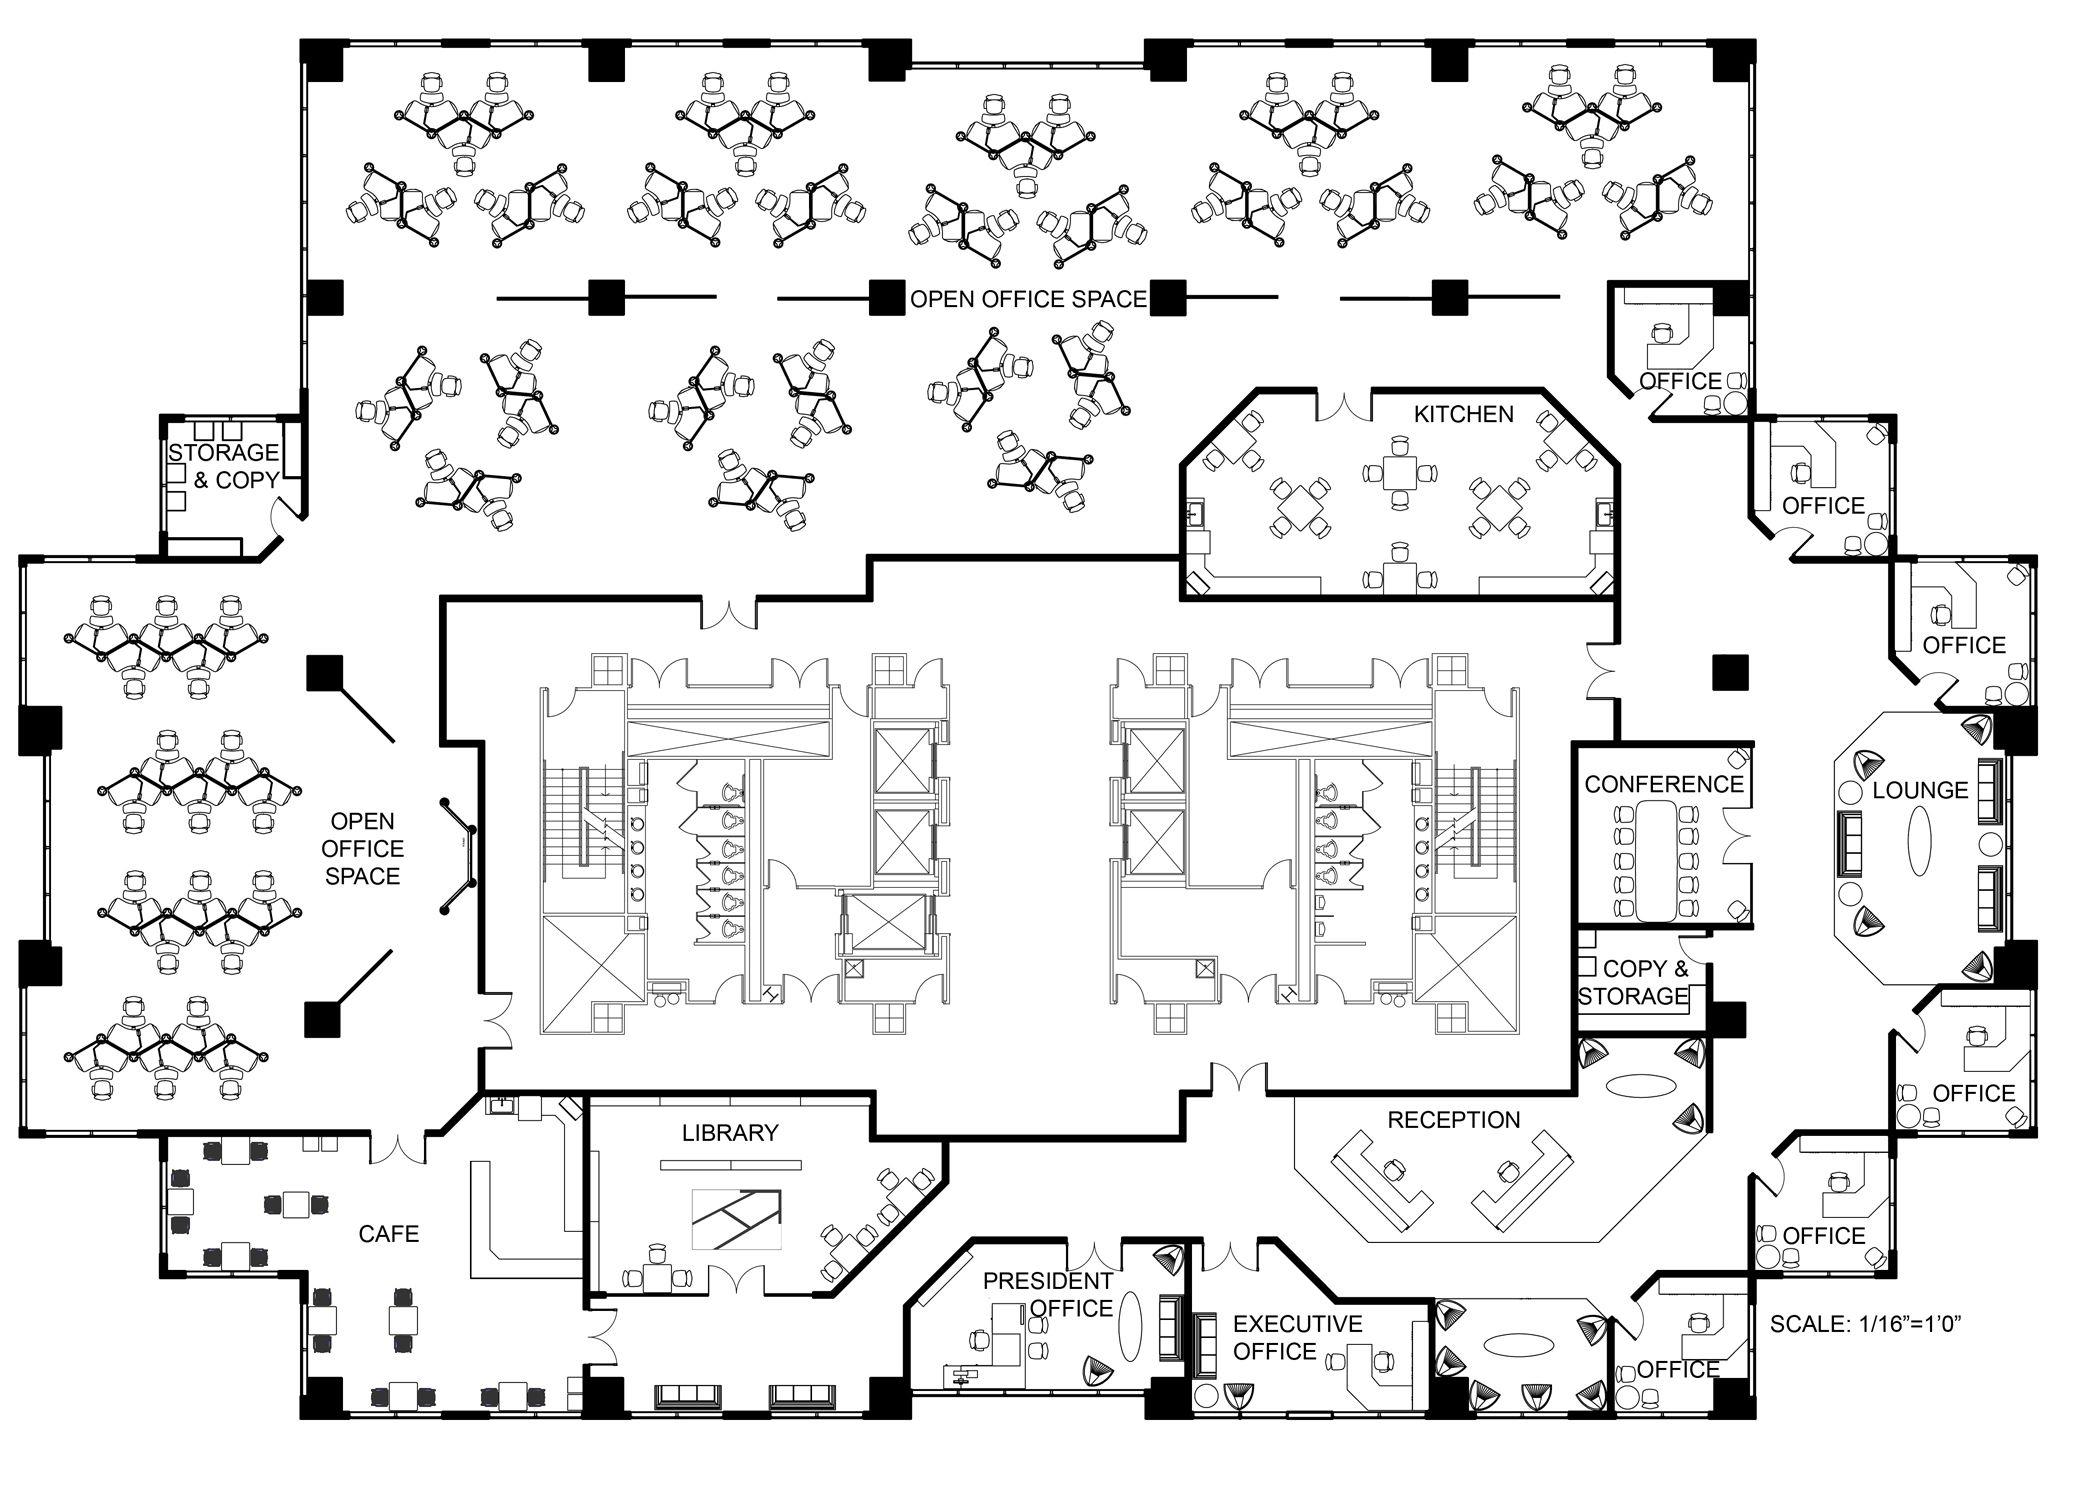 Pin By Elham Mohd On Floor Plans In